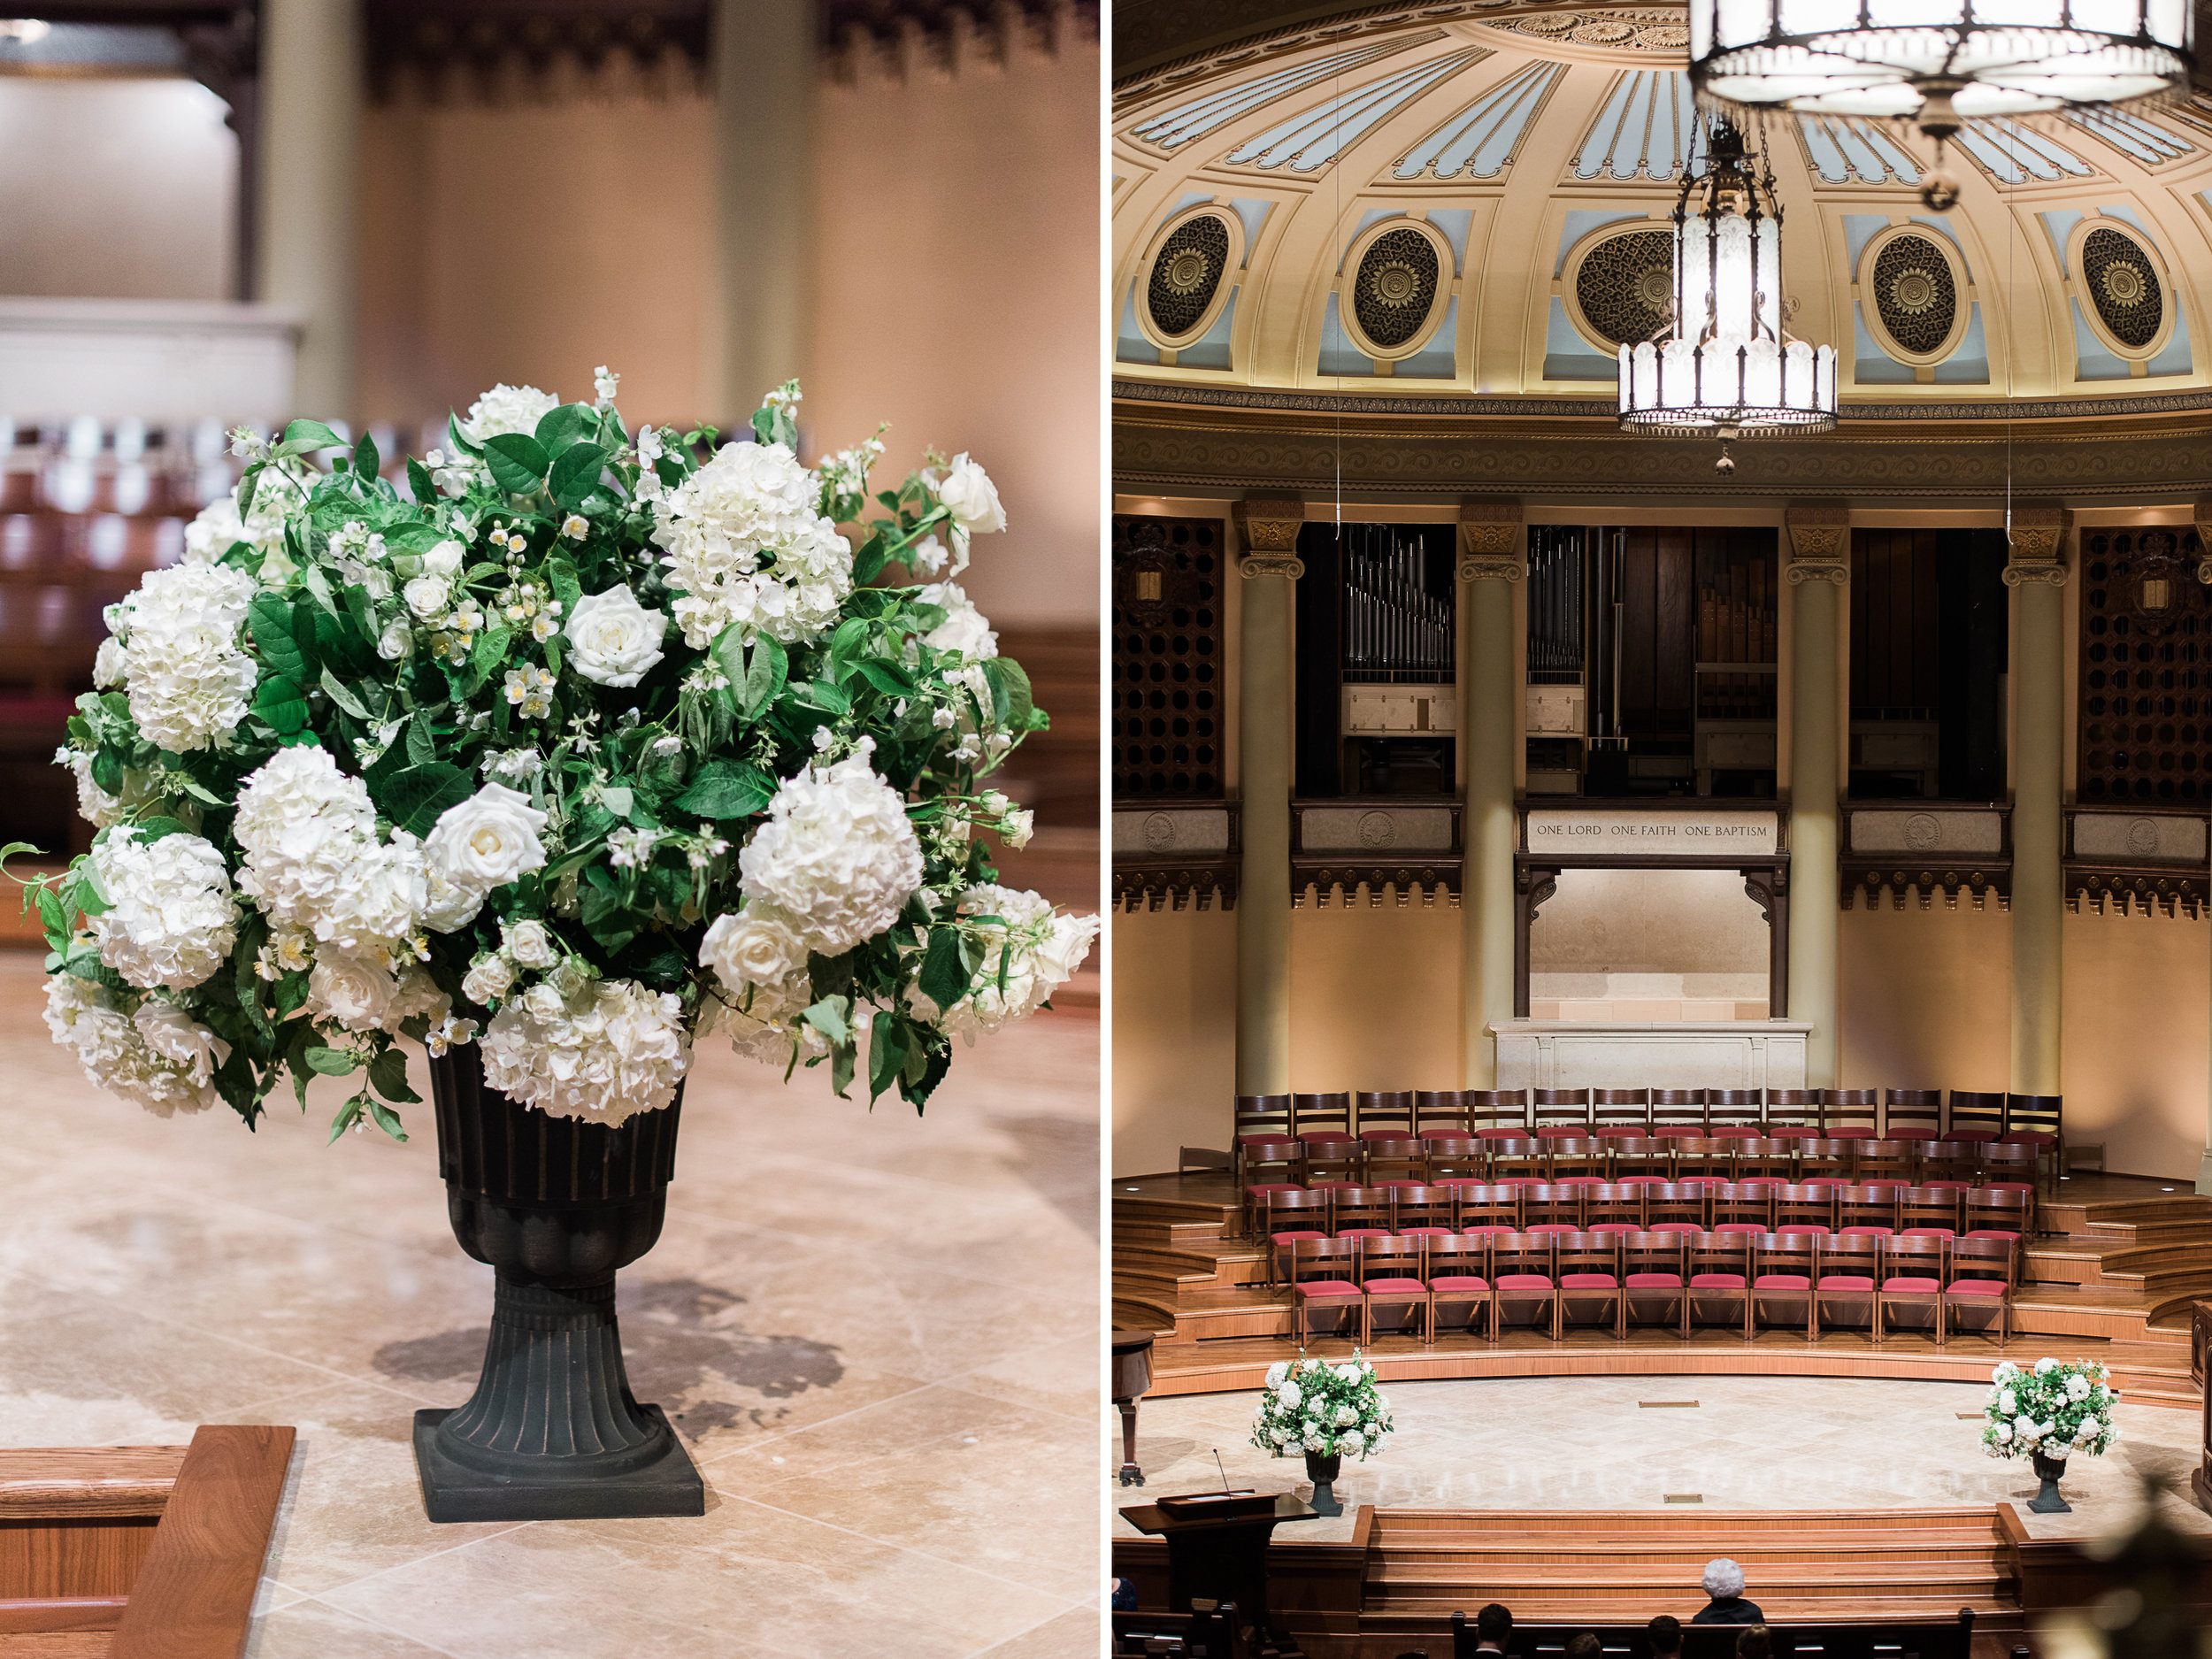 Fine-Art-Film-Houston-Wedding-Photographer-Best-Top-Luxury-Texas-Austin-Dallas-Destination-Dana-Fernandez-Photography-River-Oaks-Country-Club-South-Main-Baptist-Ceremony-Reception-Wedding-137.jpg